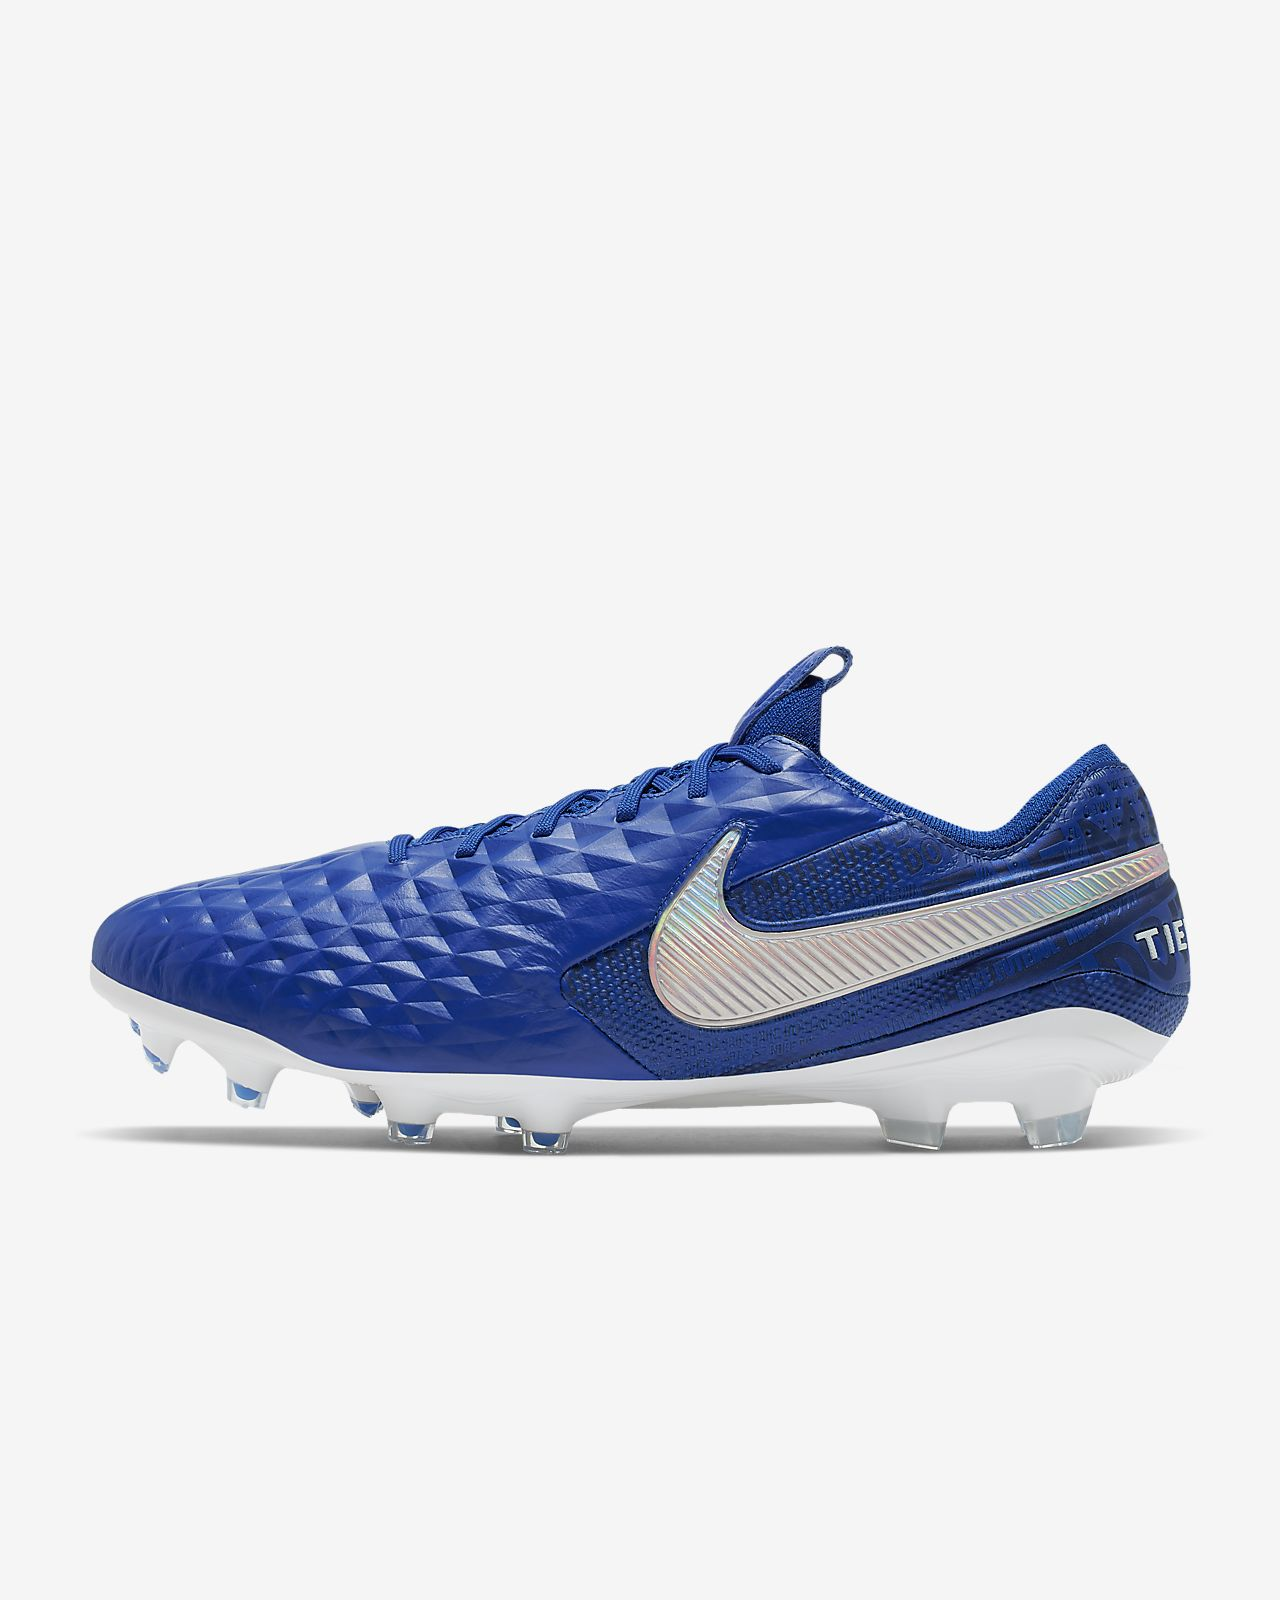 Calzado de fútbol para terreno firme Nike Tiempo Legend 8 Elite FG